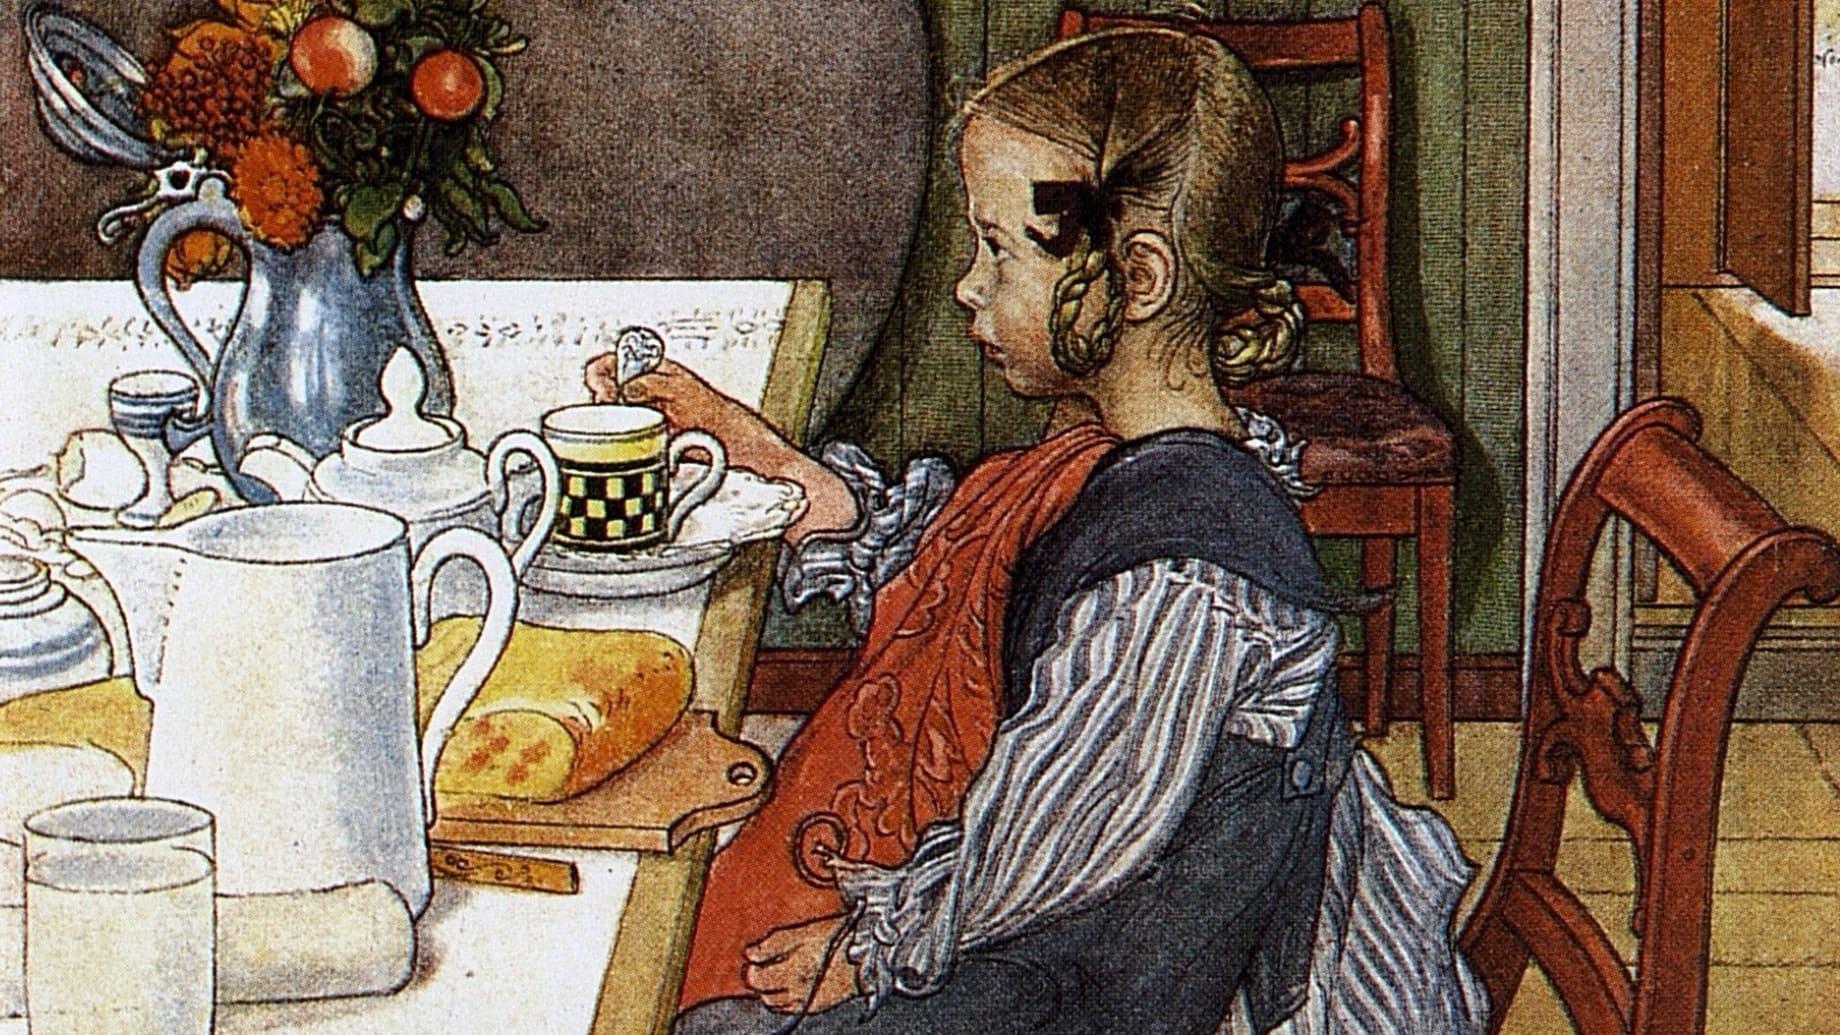 Карл Улоф Ларссон – знаменитый шведский художник